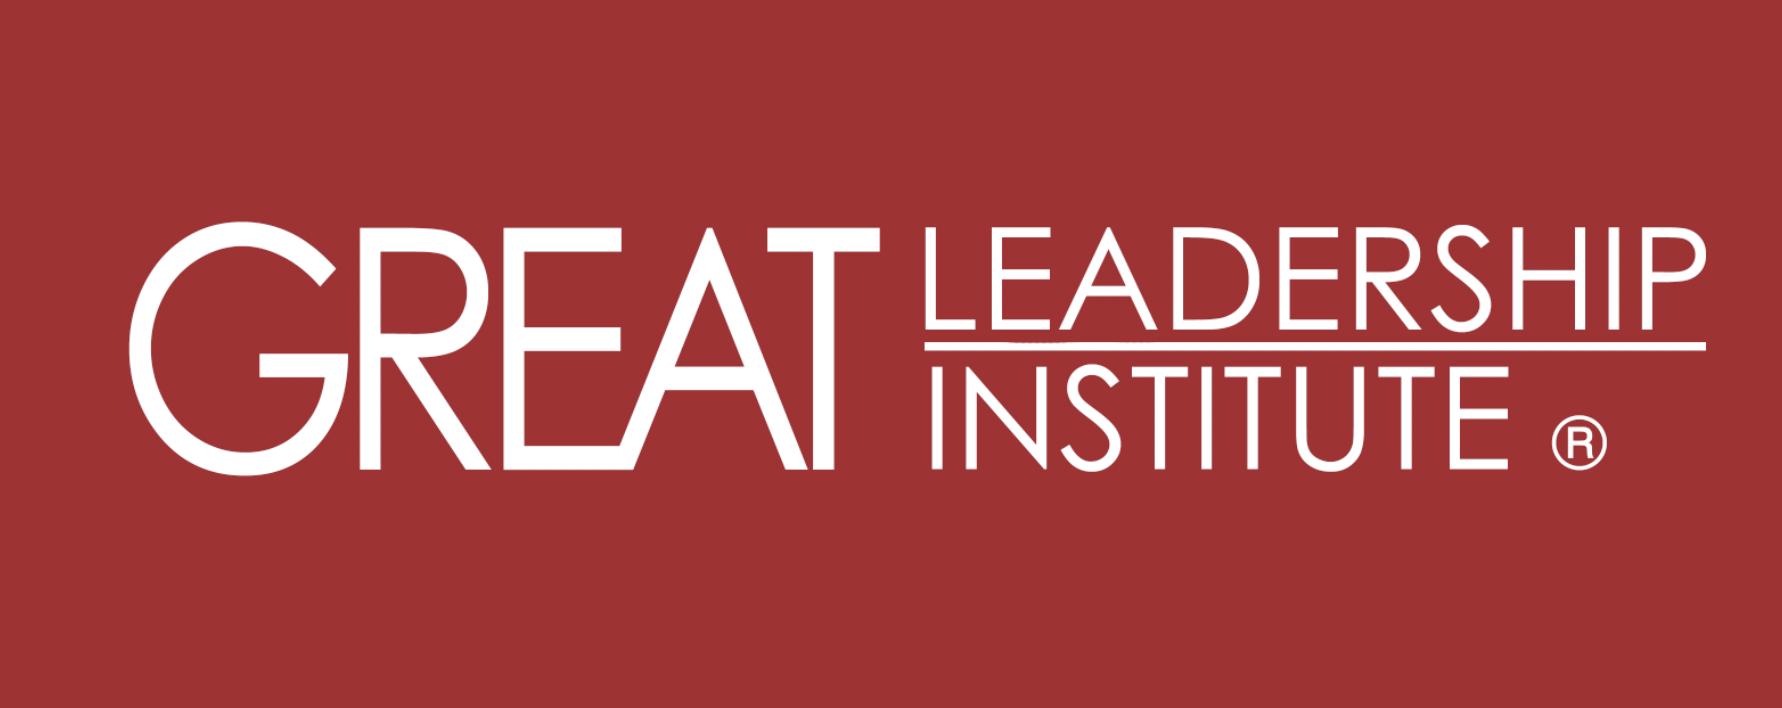 Great Leadership Institute®